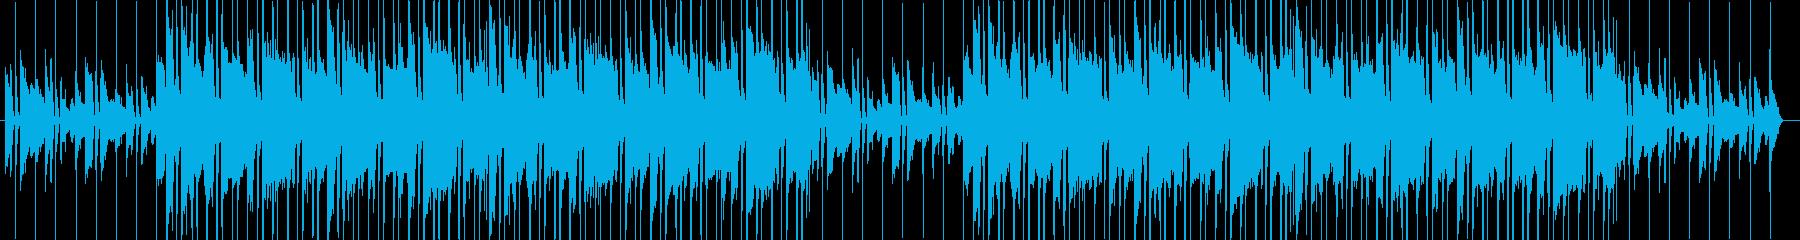 Break Pianoの再生済みの波形